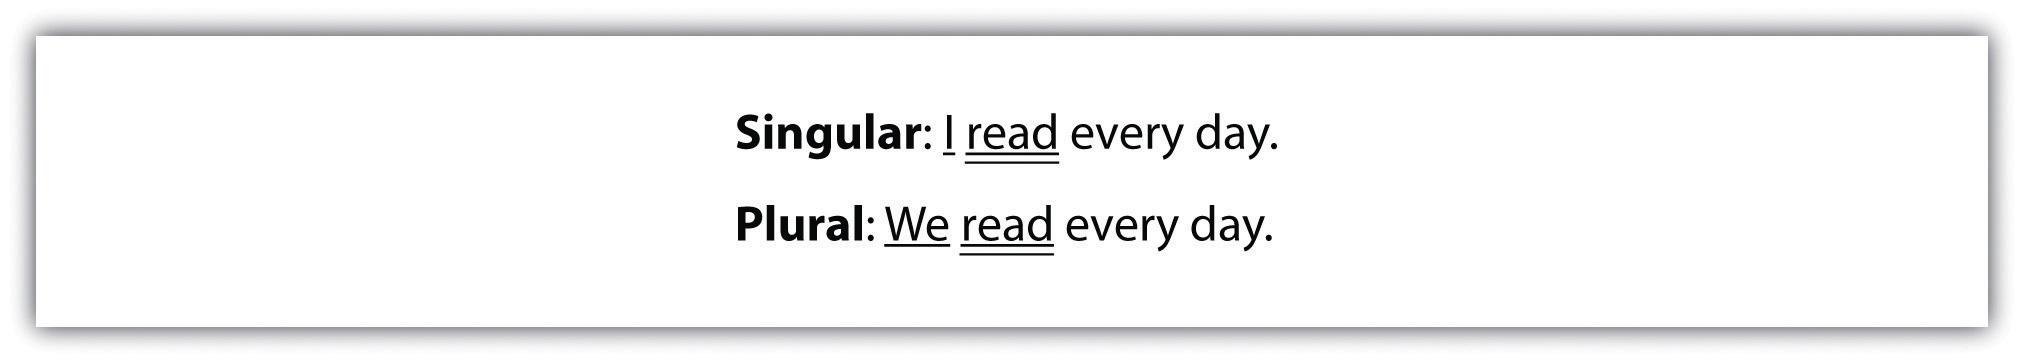 How do I make these sentences flow better?